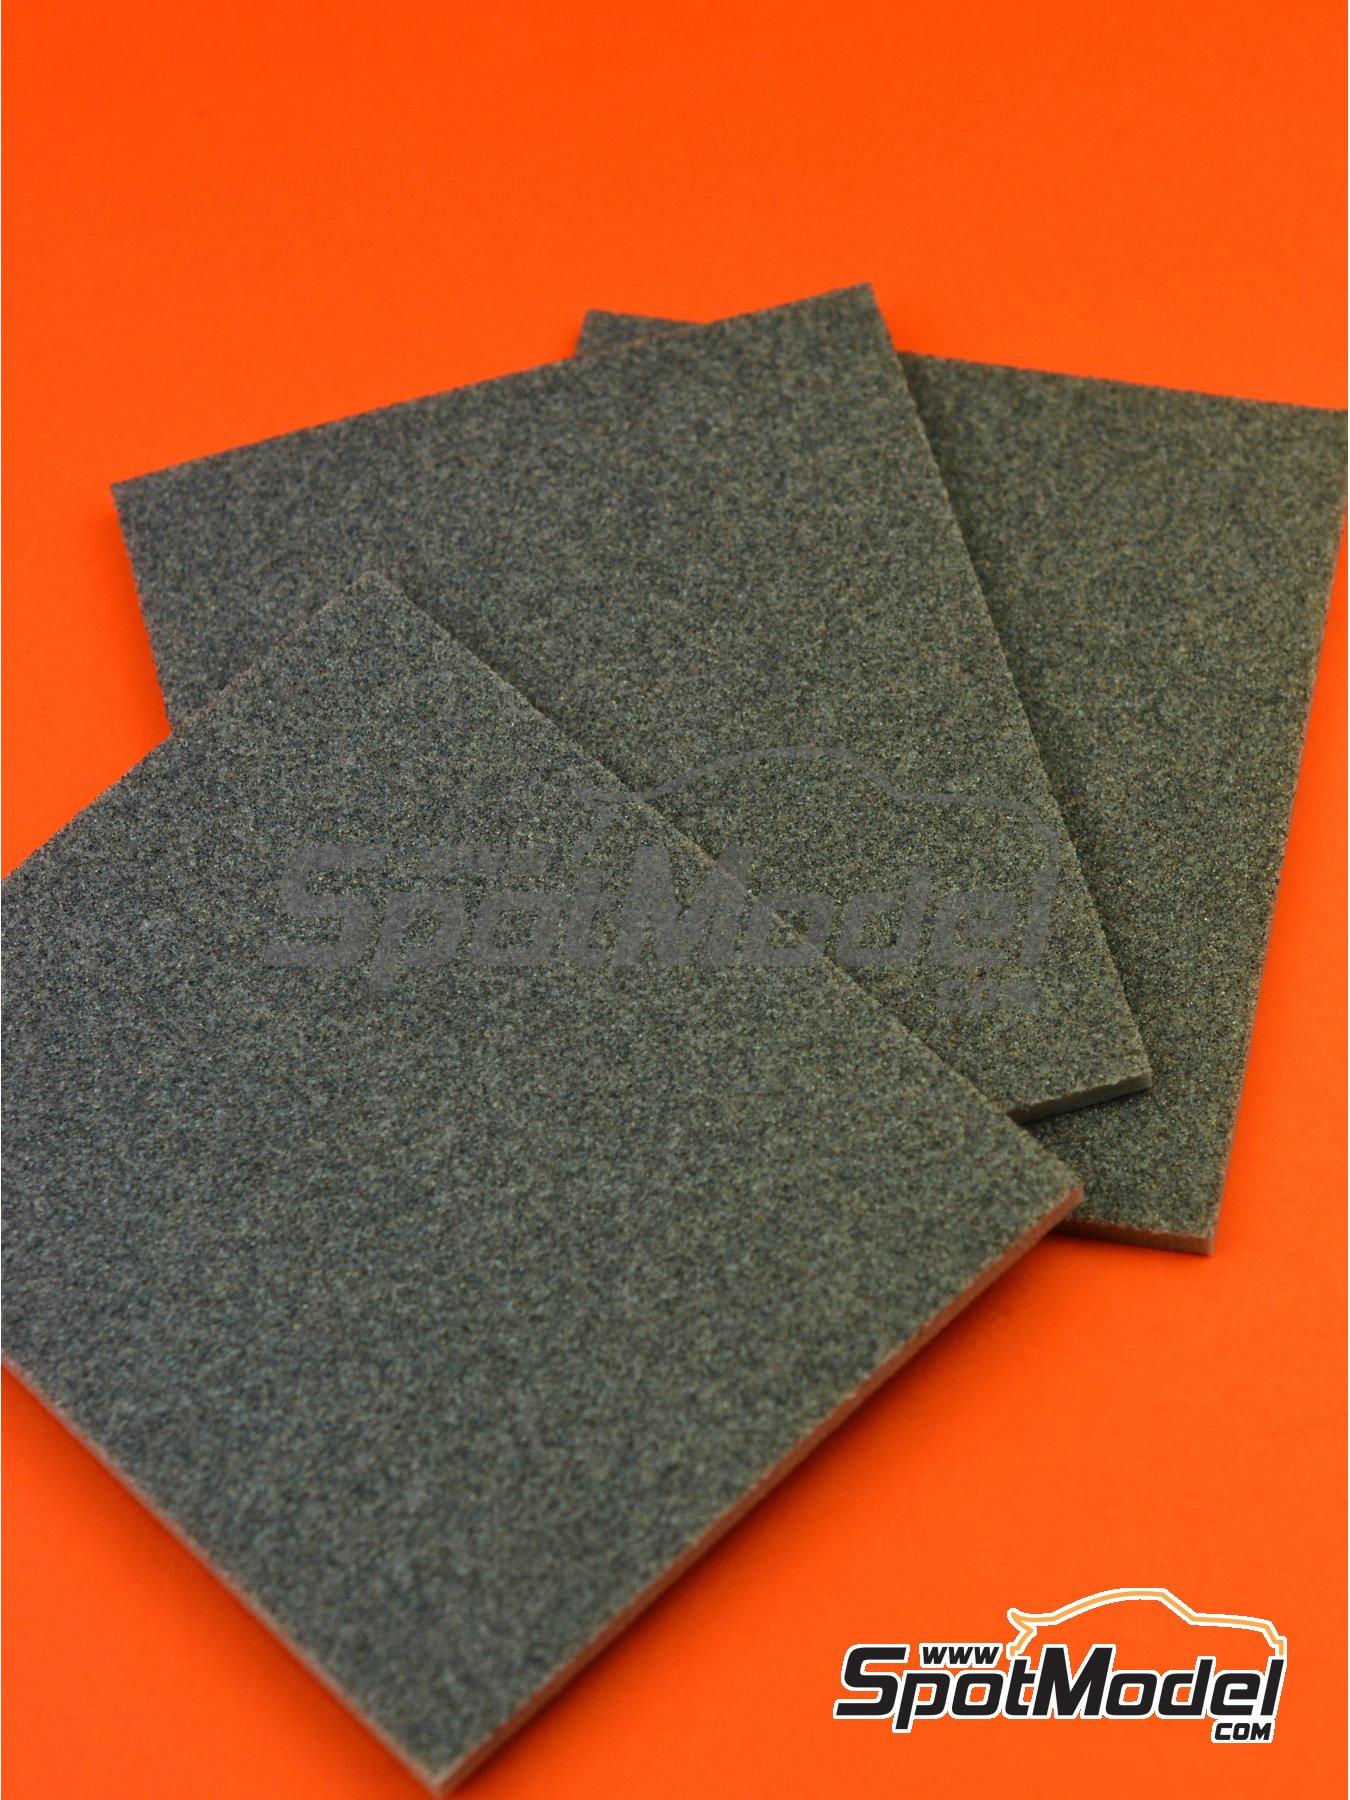 Medium sand sponge | Sandpaper manufactured by SpotModel (ref.SPOT-012) image